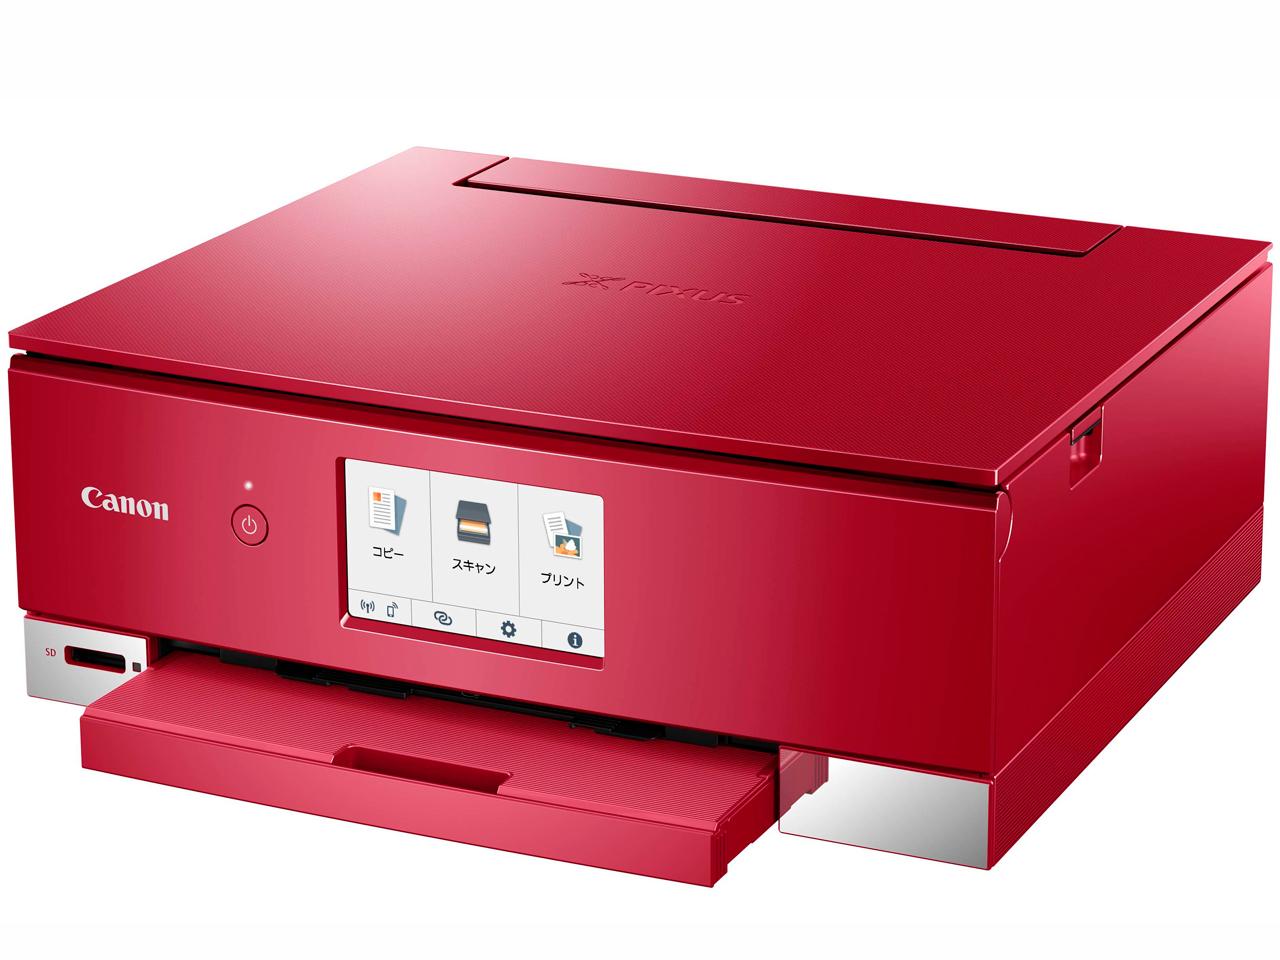 PIXUS TS8230 [レッド] の製品画像